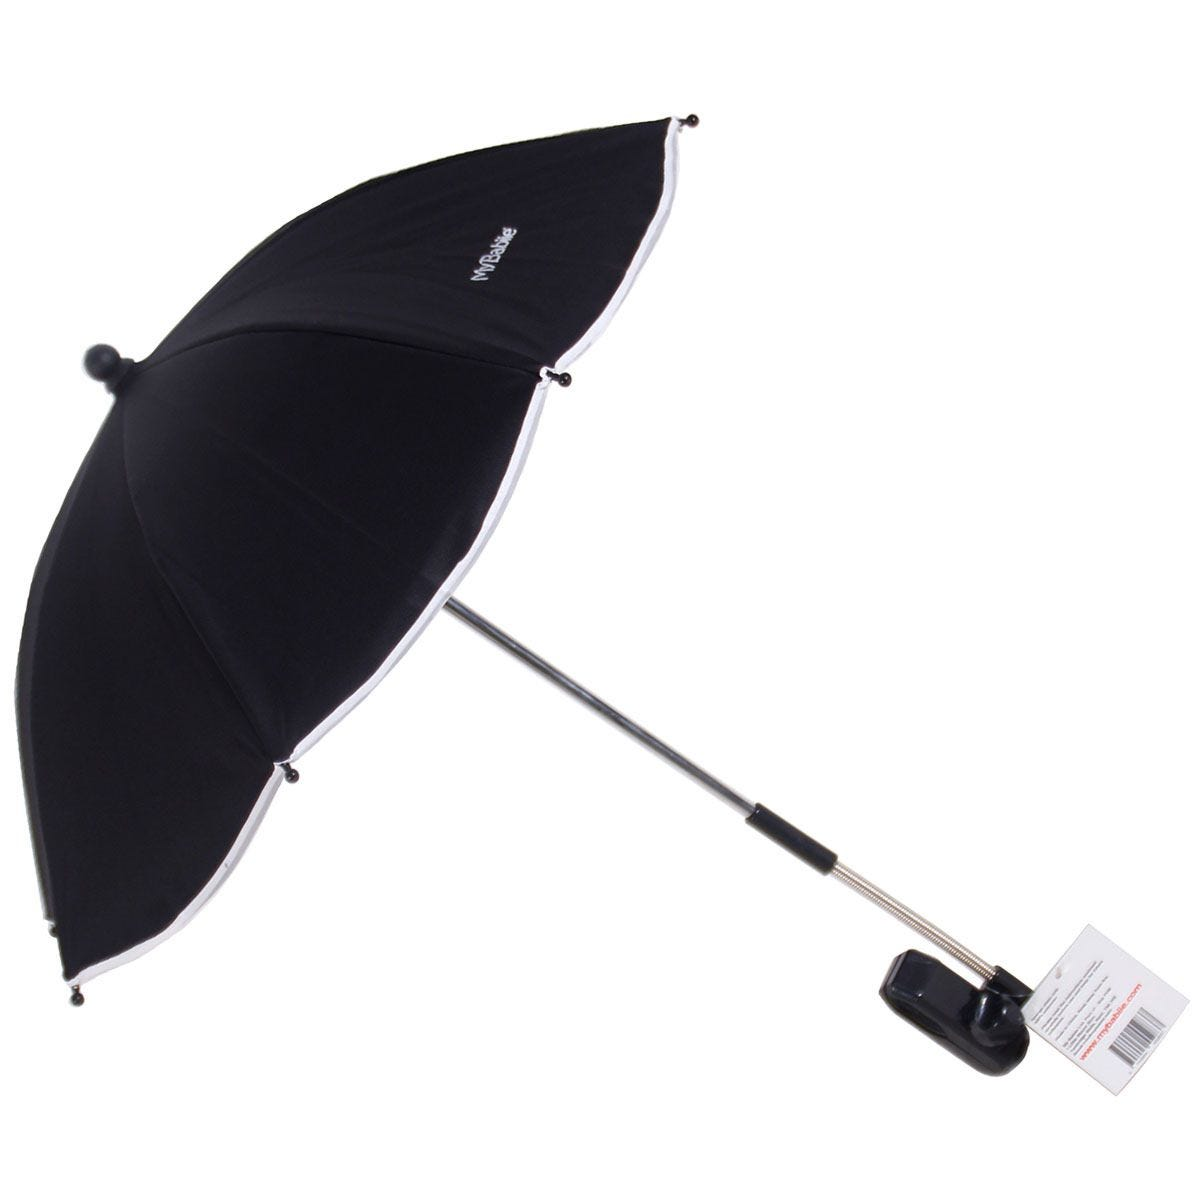 My Babiie Pushchair Parasol - Black